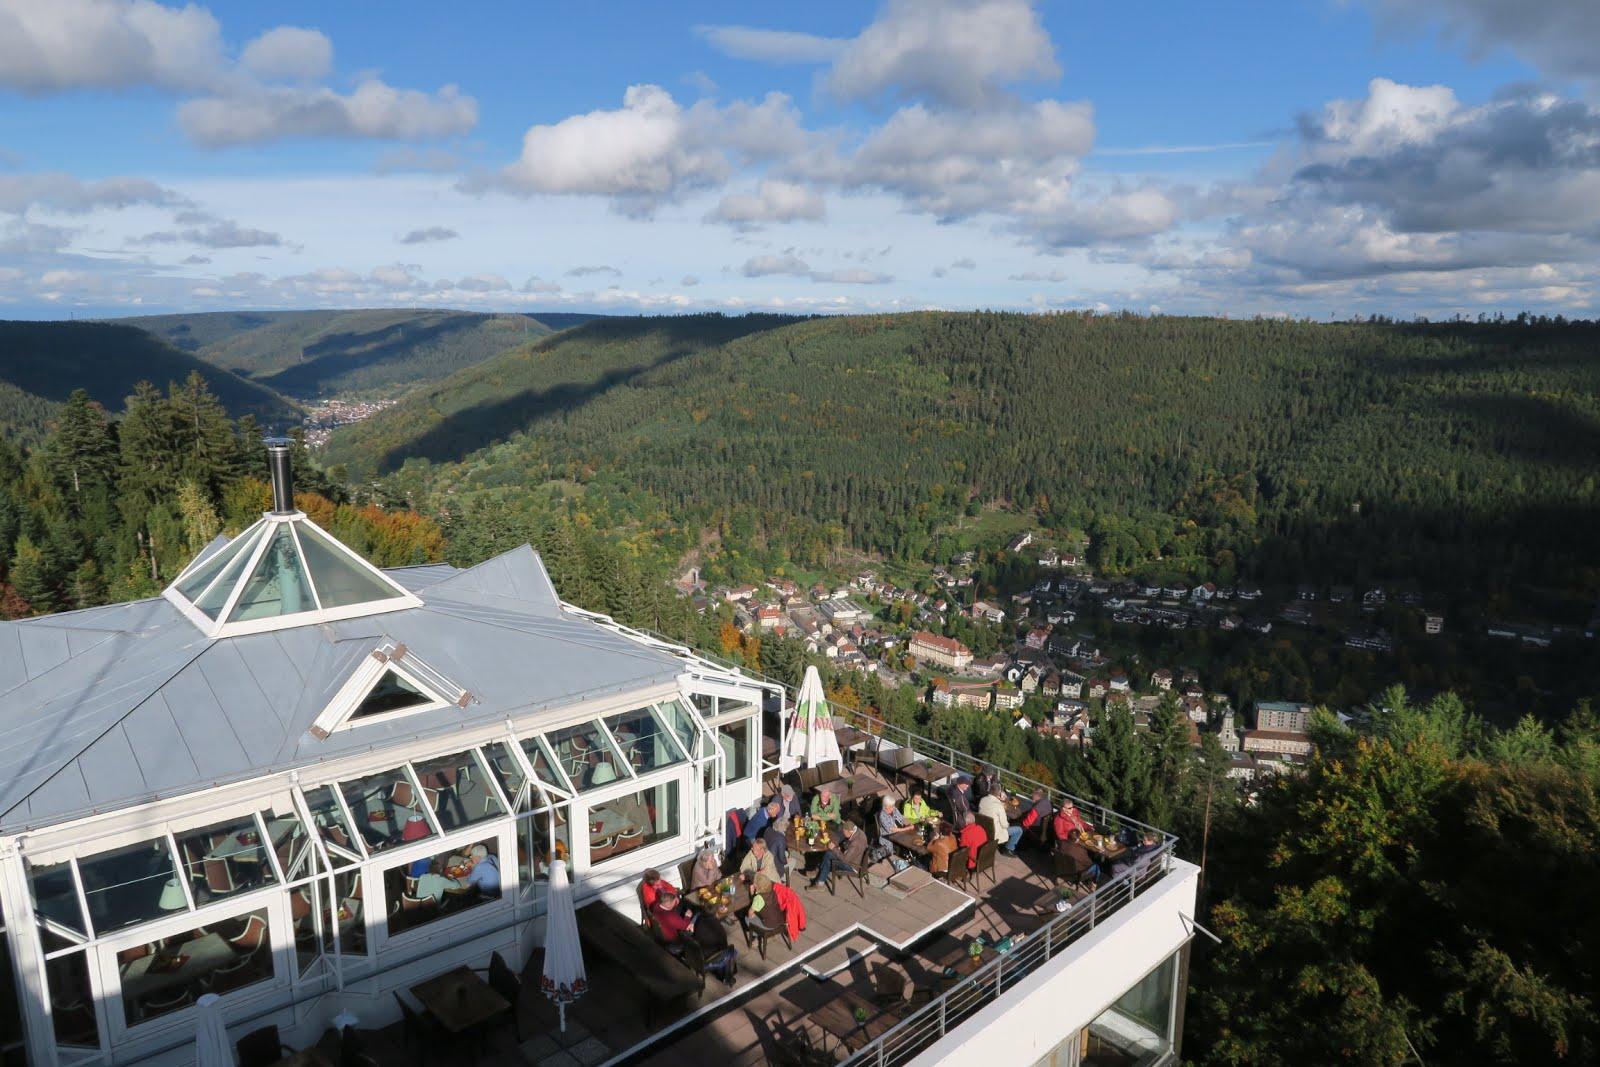 Sommerberghotel Bad Wildbad